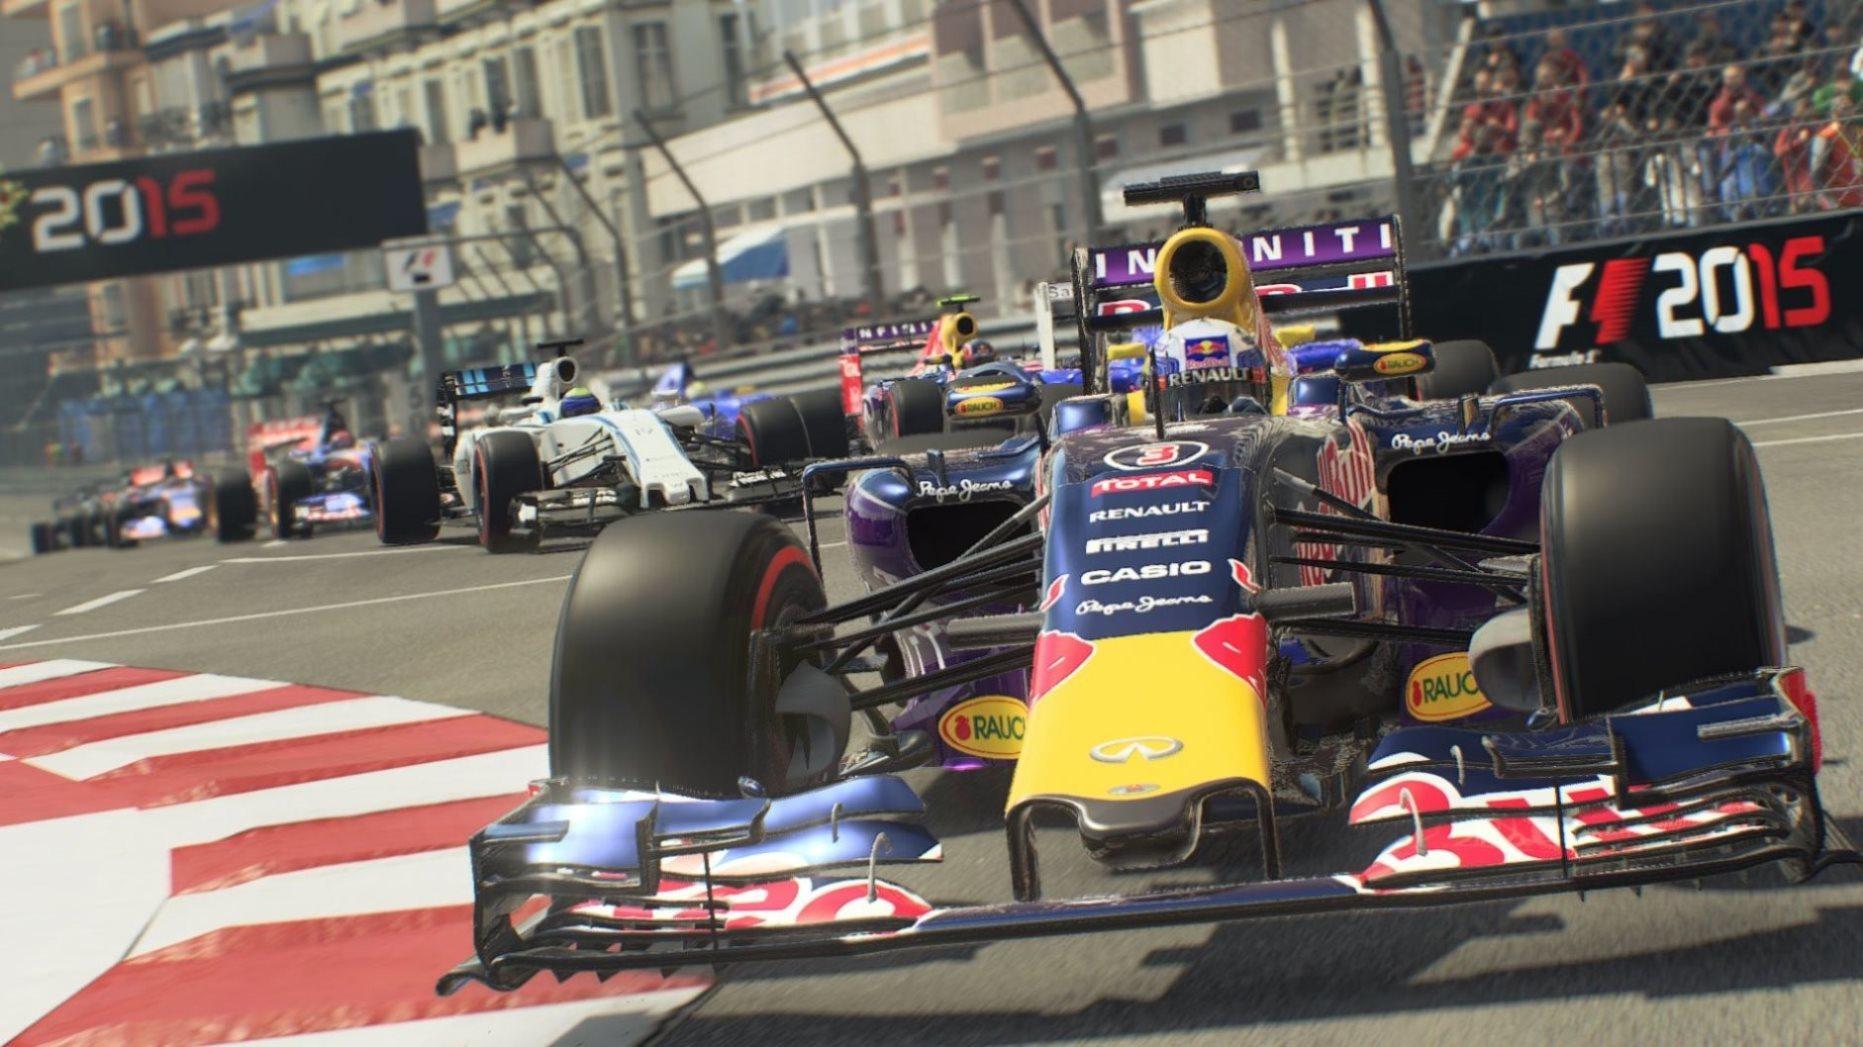 F1 2015 Review Screenshot 1